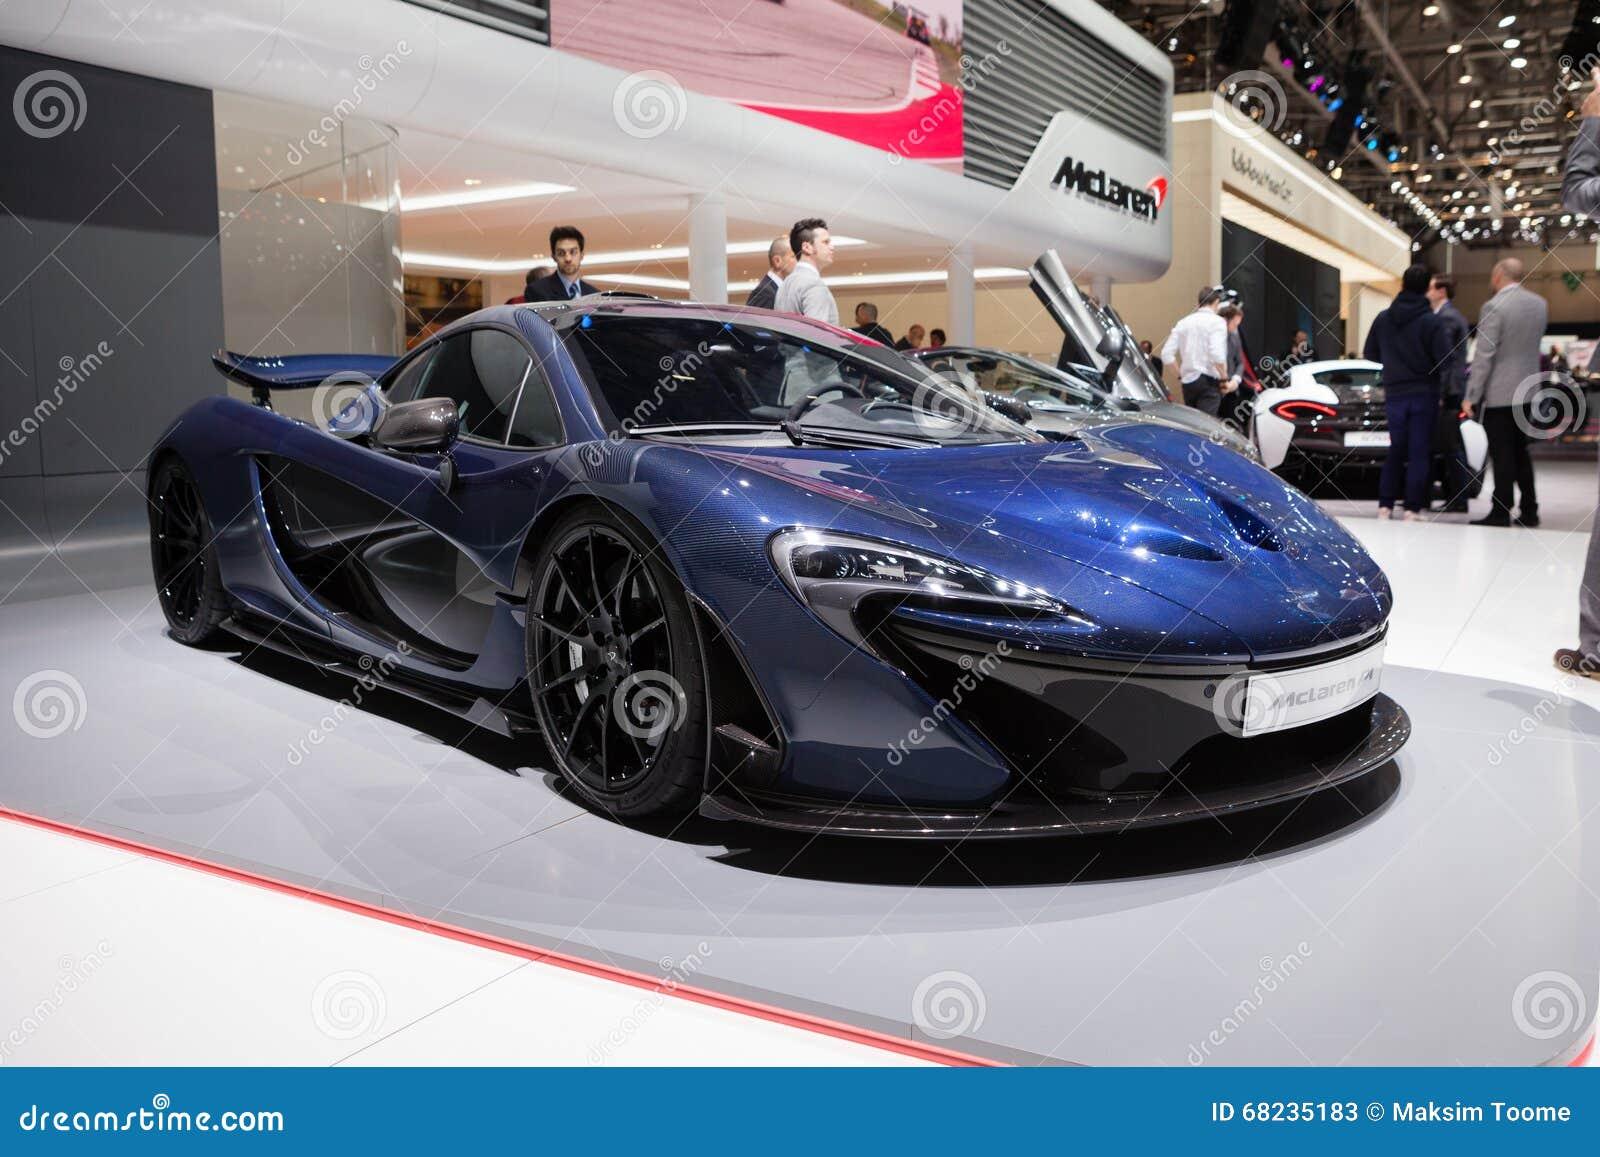 Mclaren P1 In Geneva Editorial Stock Photo Image Of Automotive 68235183